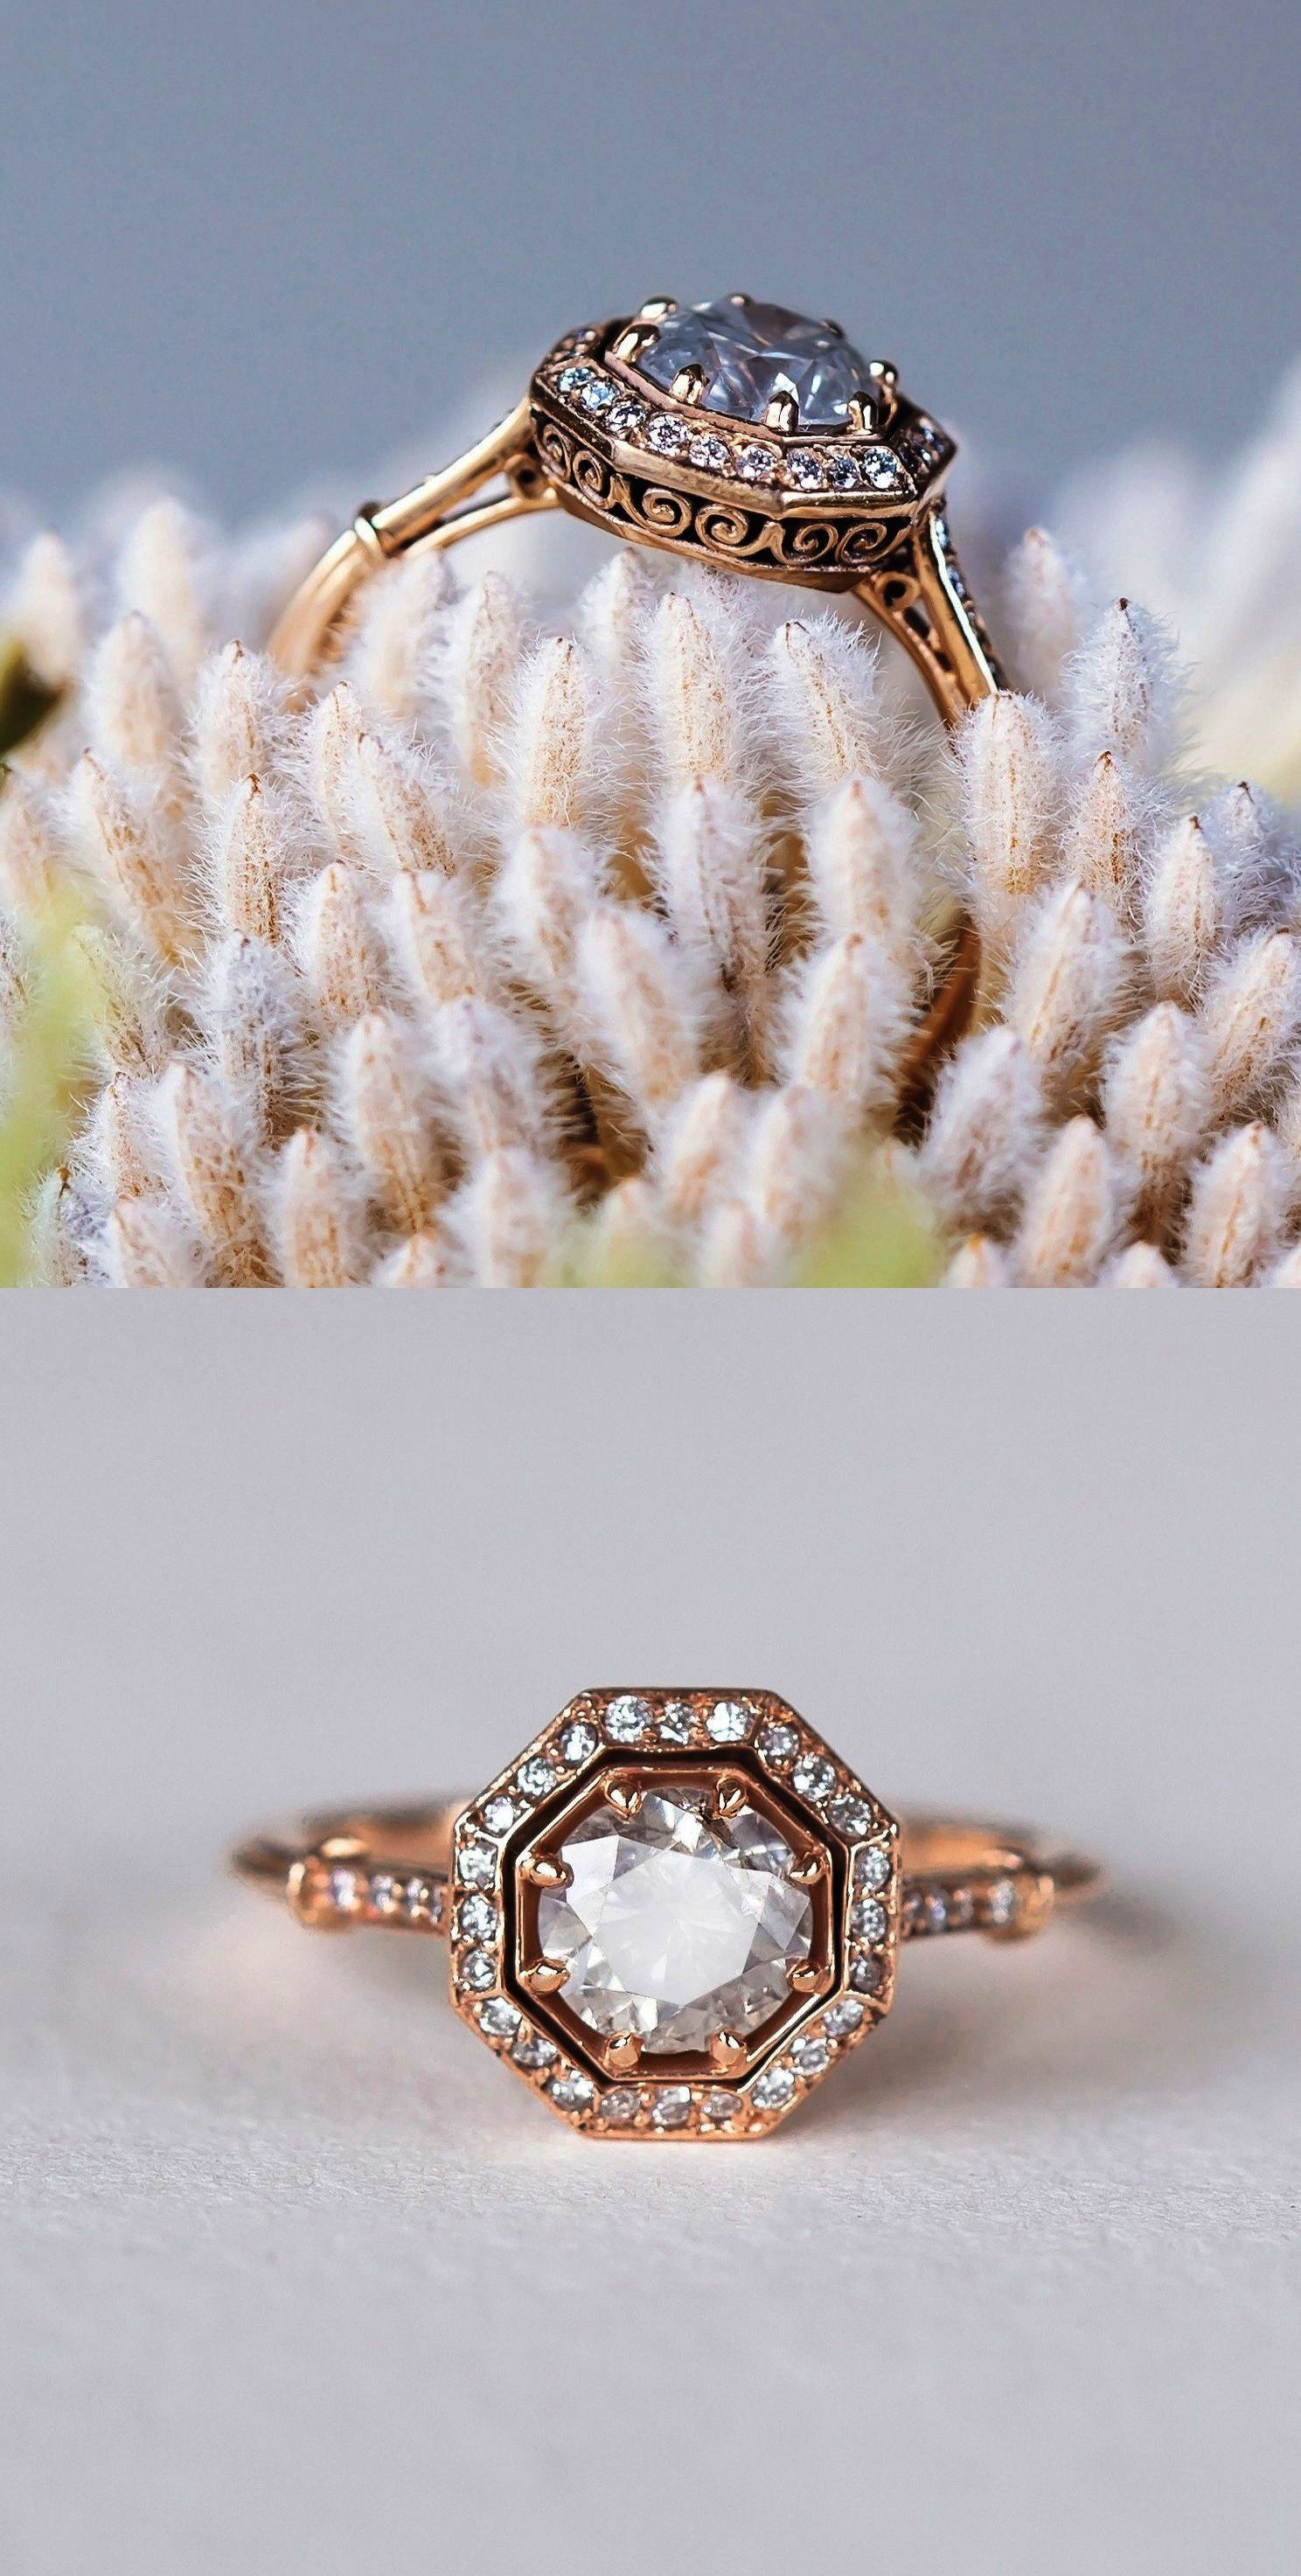 Jewellery Sale Malaysia 2018 under Jewellery Shops Around